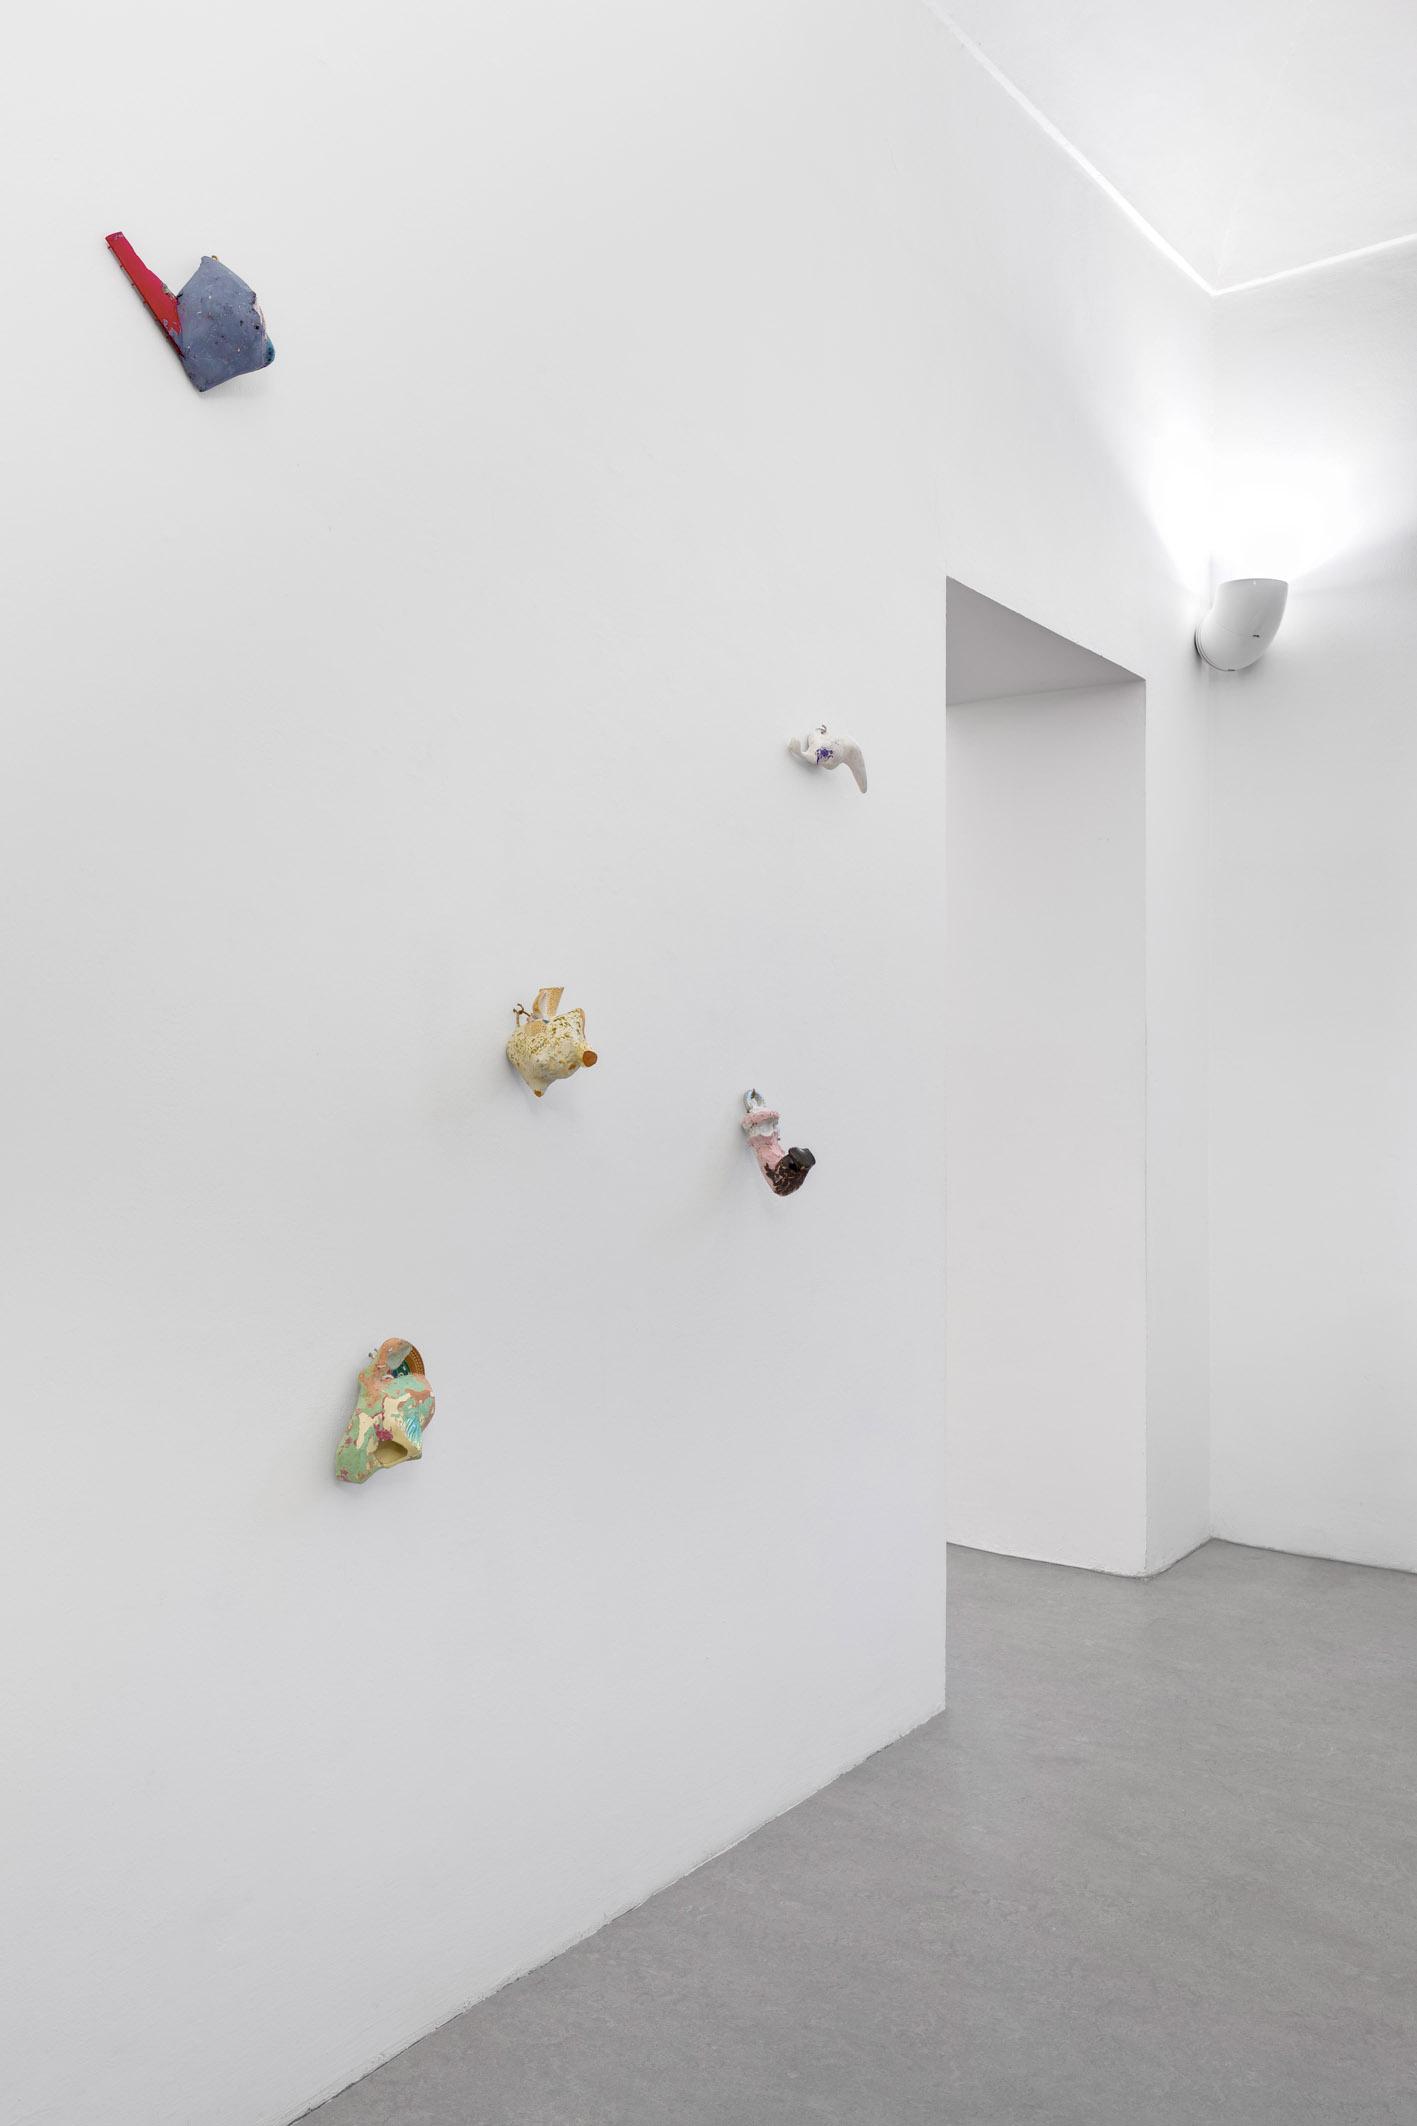 Francesca-Ferreri-Cluster-Clutter-installation-view-1